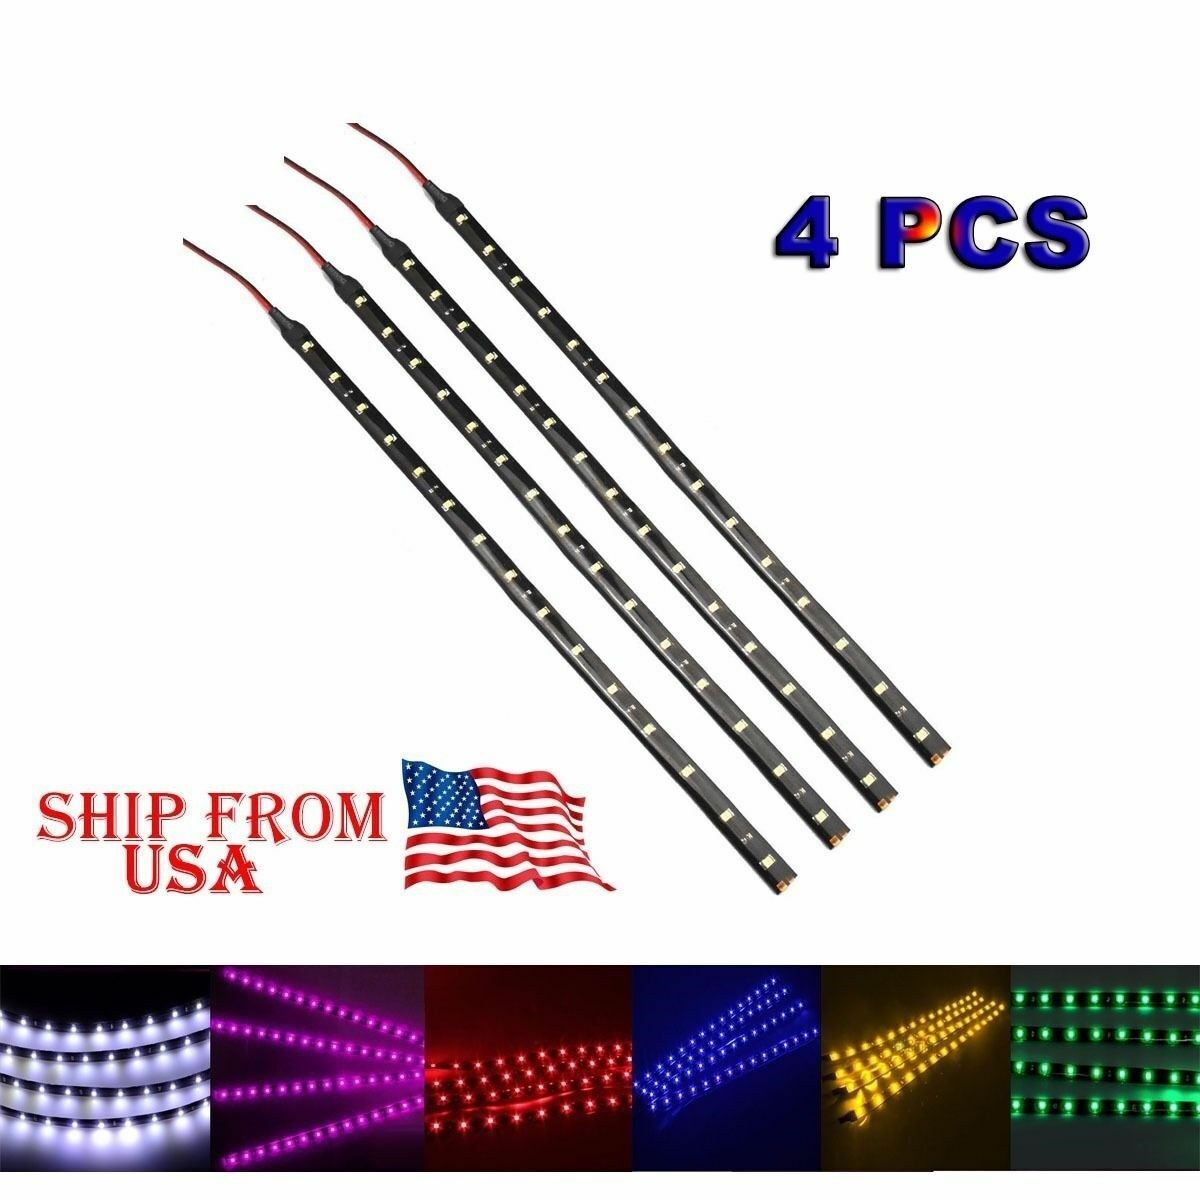 "4 PCS 12V 12"" 1FT 15SMD Flexible LED Strip Light Waterproof"